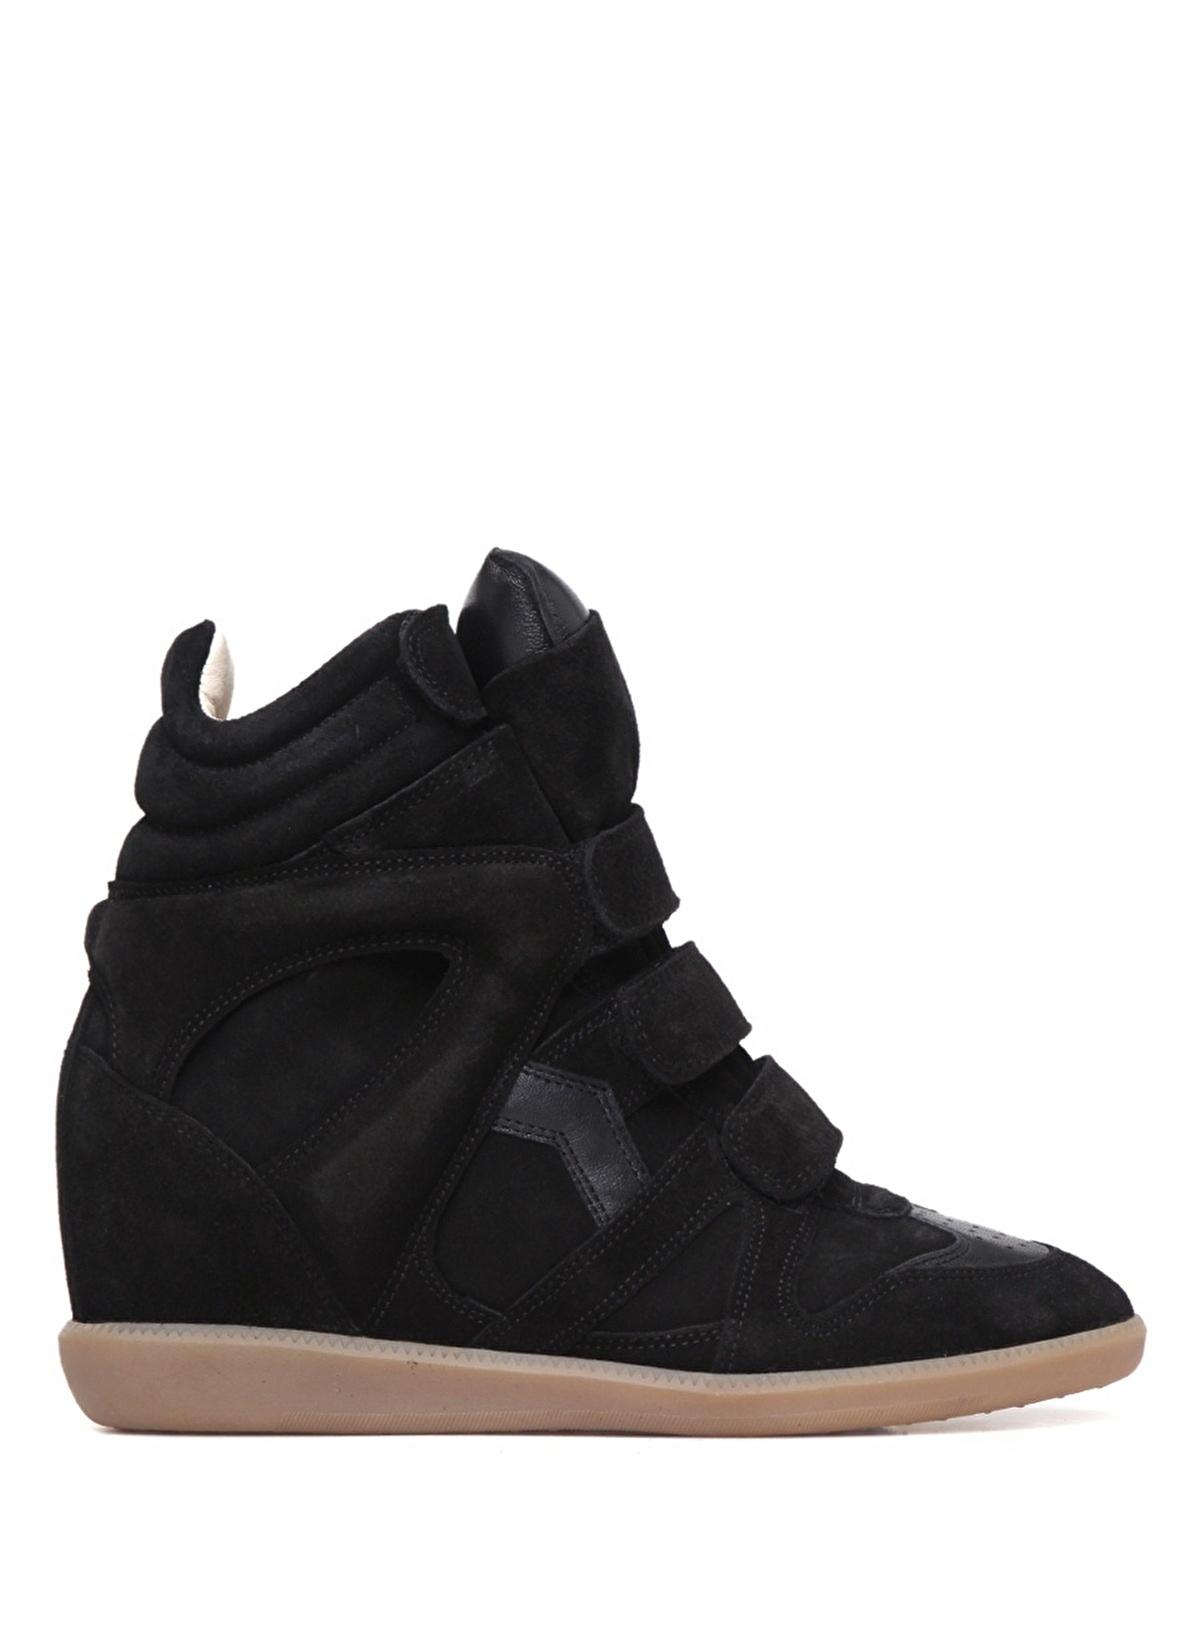 on sale 77459 d7823 Etoile Isabel Marant Lifestyle Ayakkabı Siyah ...